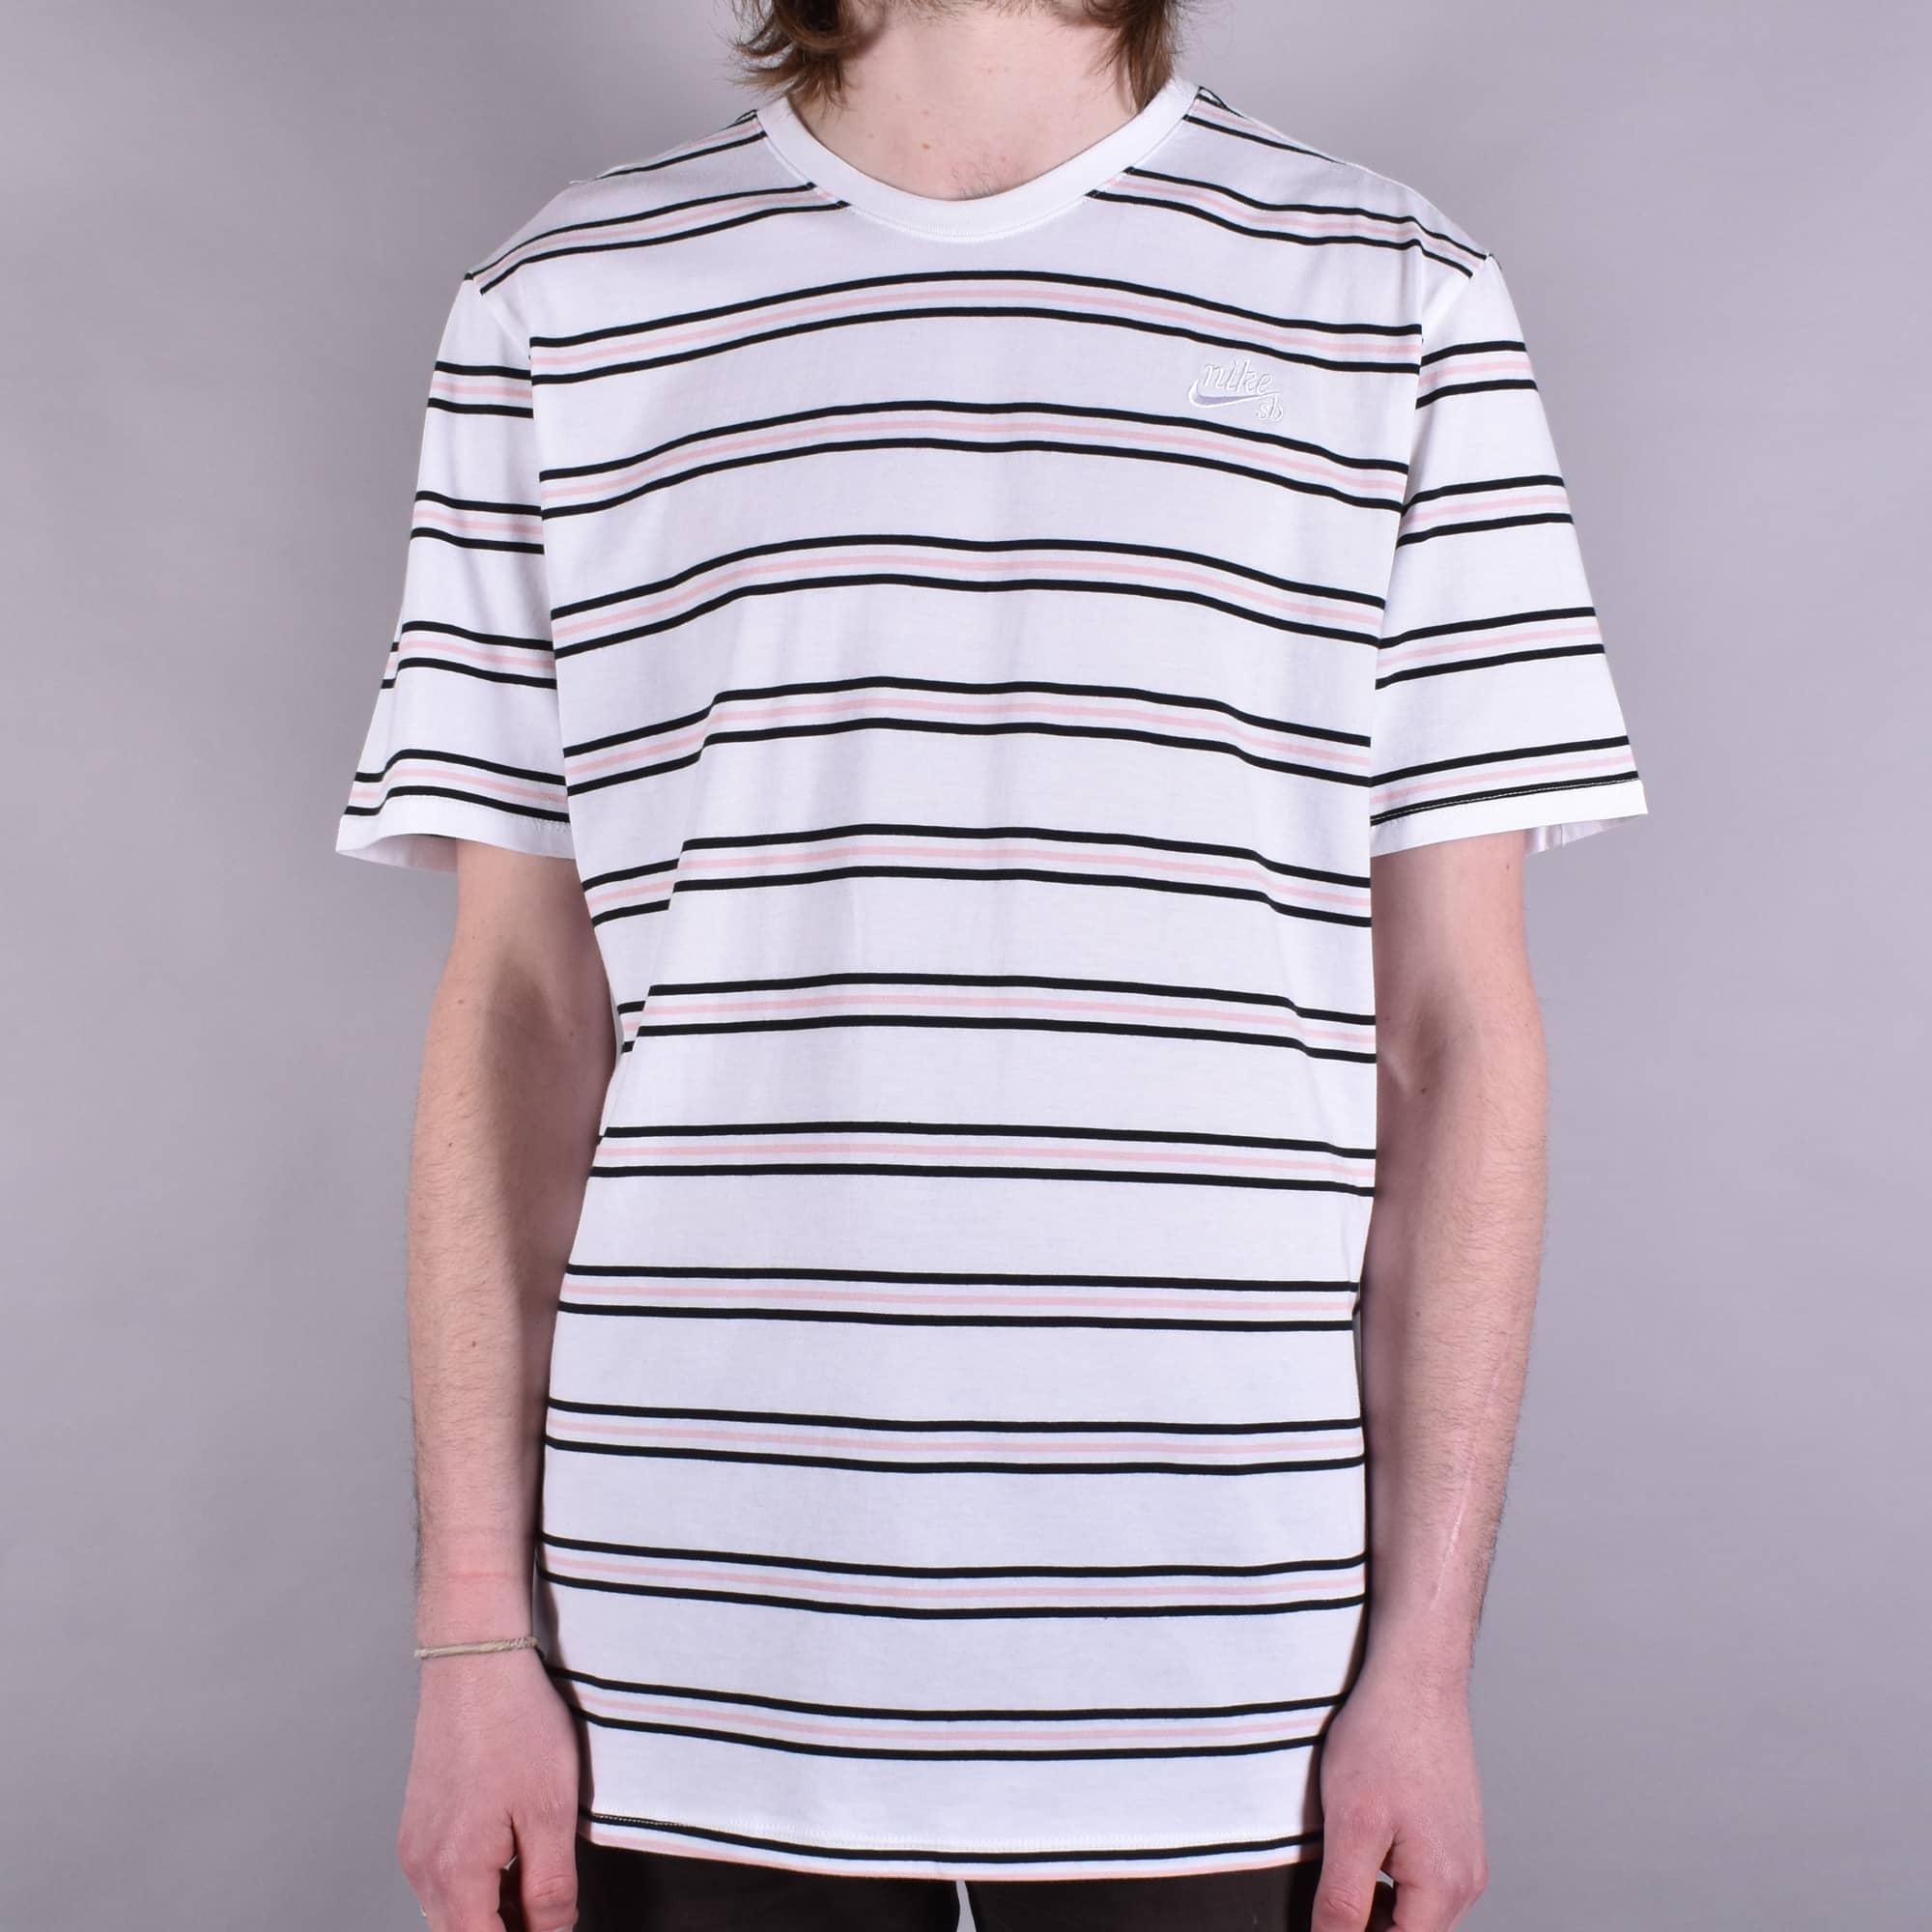 nike striped t shirt